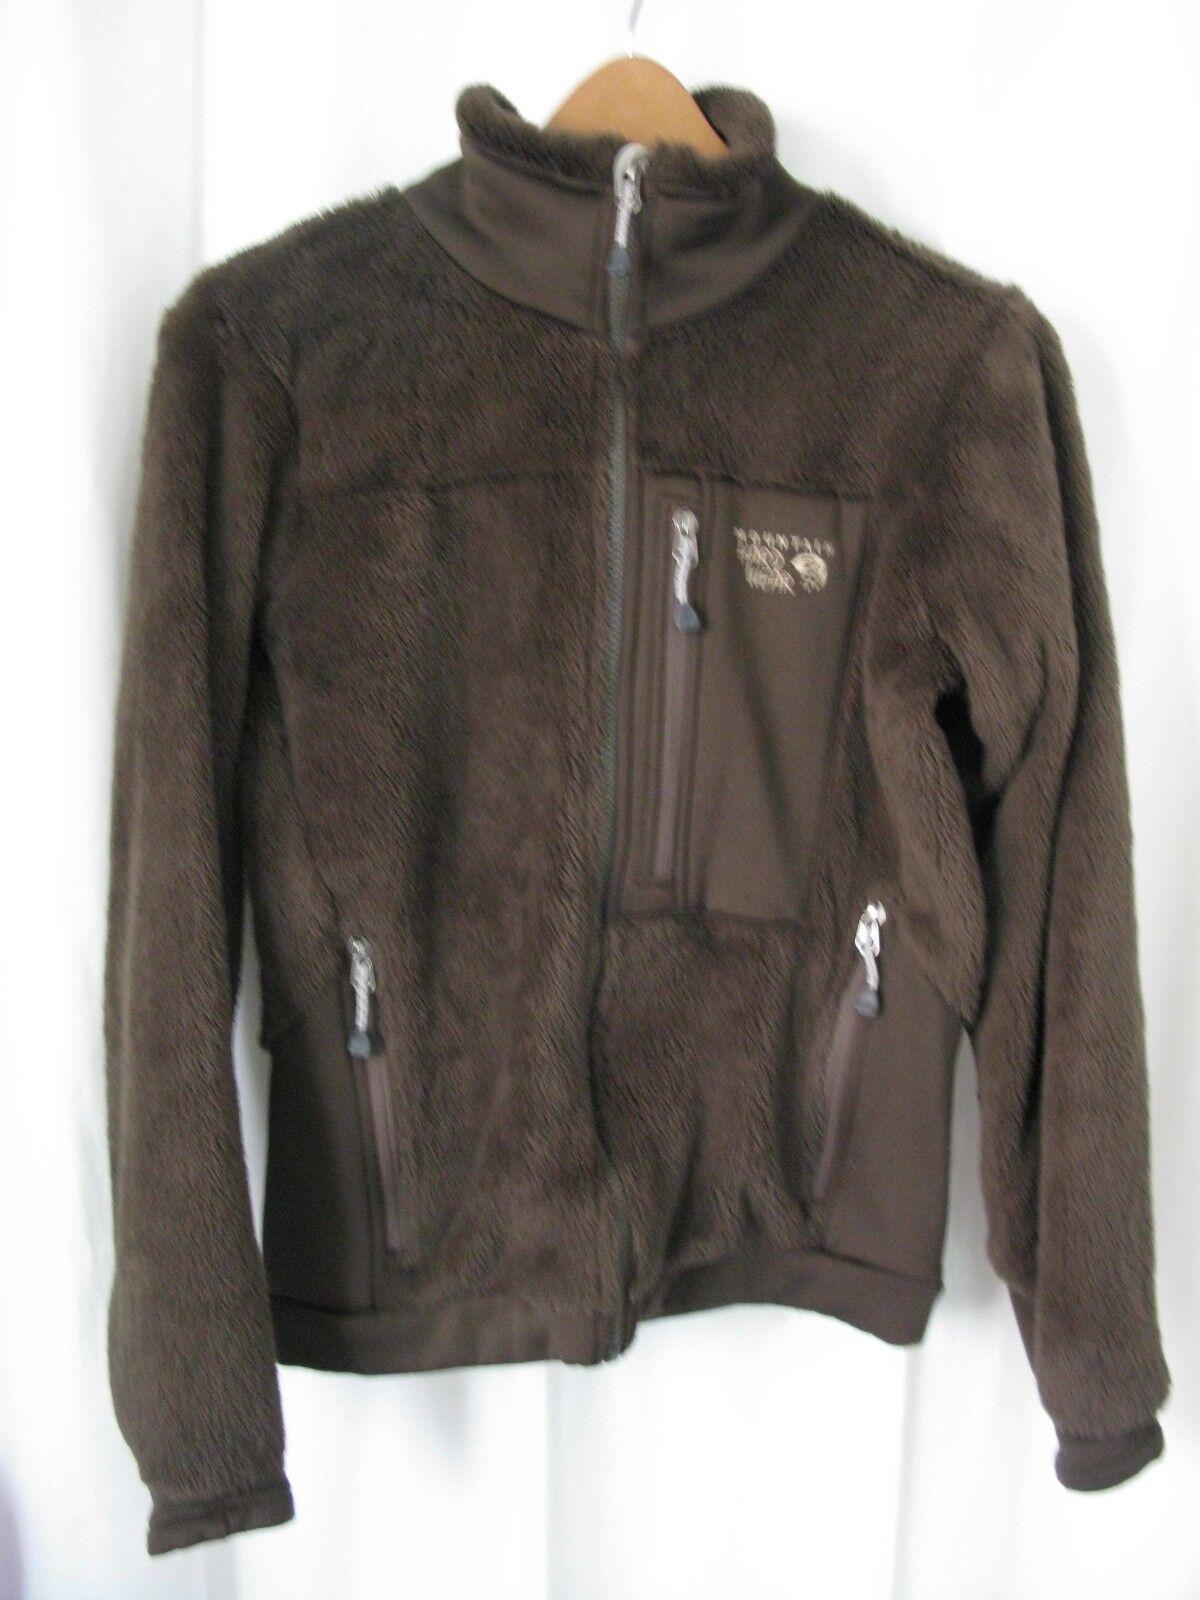 171281 Women's S MOUNTAIN HARWEAR Monkey Brown Polartec Fleece Zip Jacket EUC